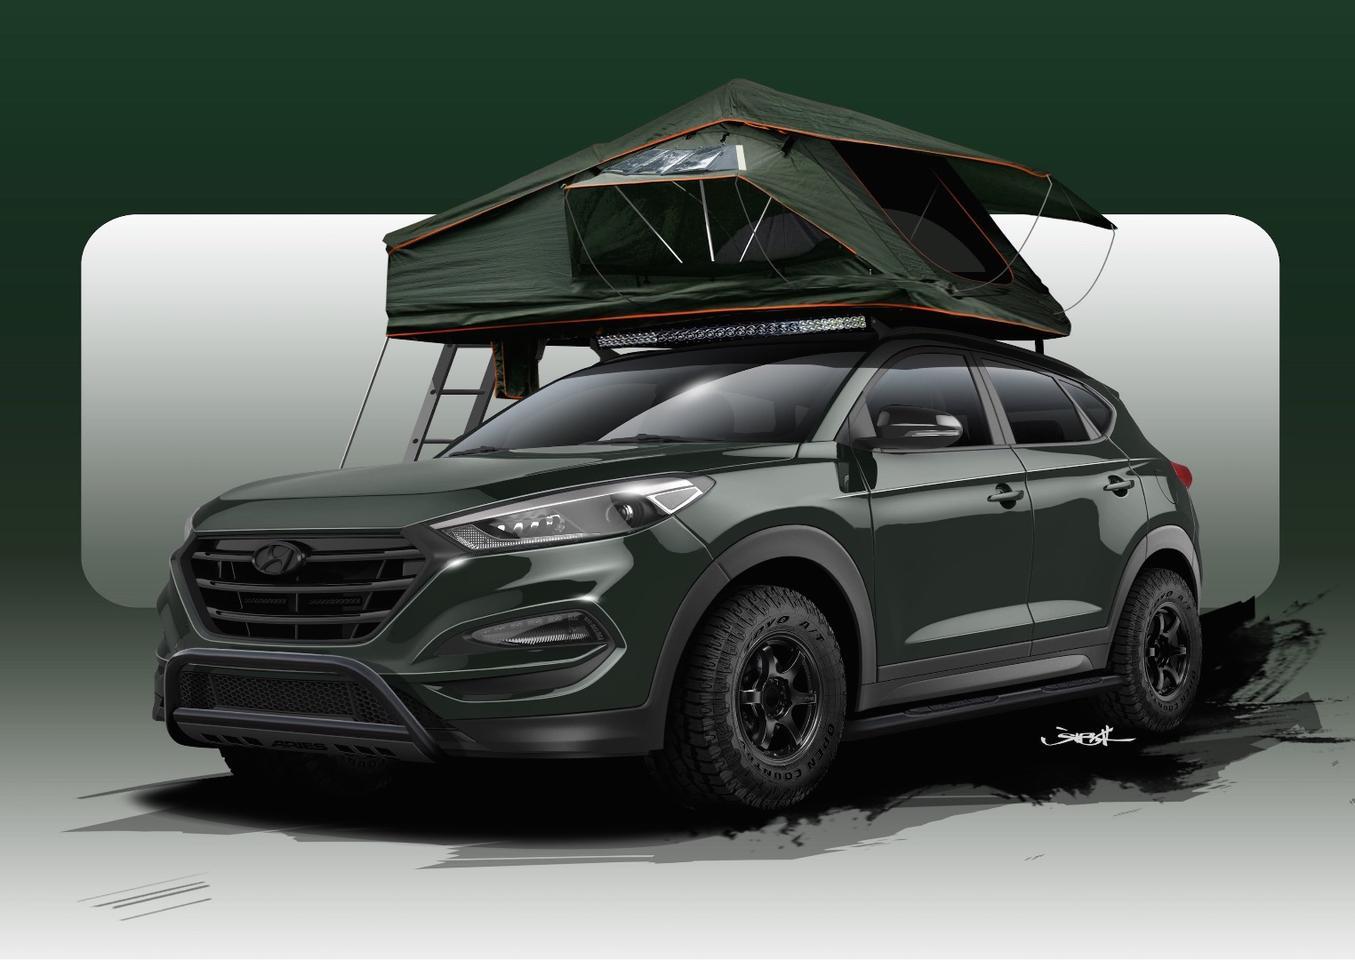 Hyundai Tucson Adventuremobile by John Pangilinan